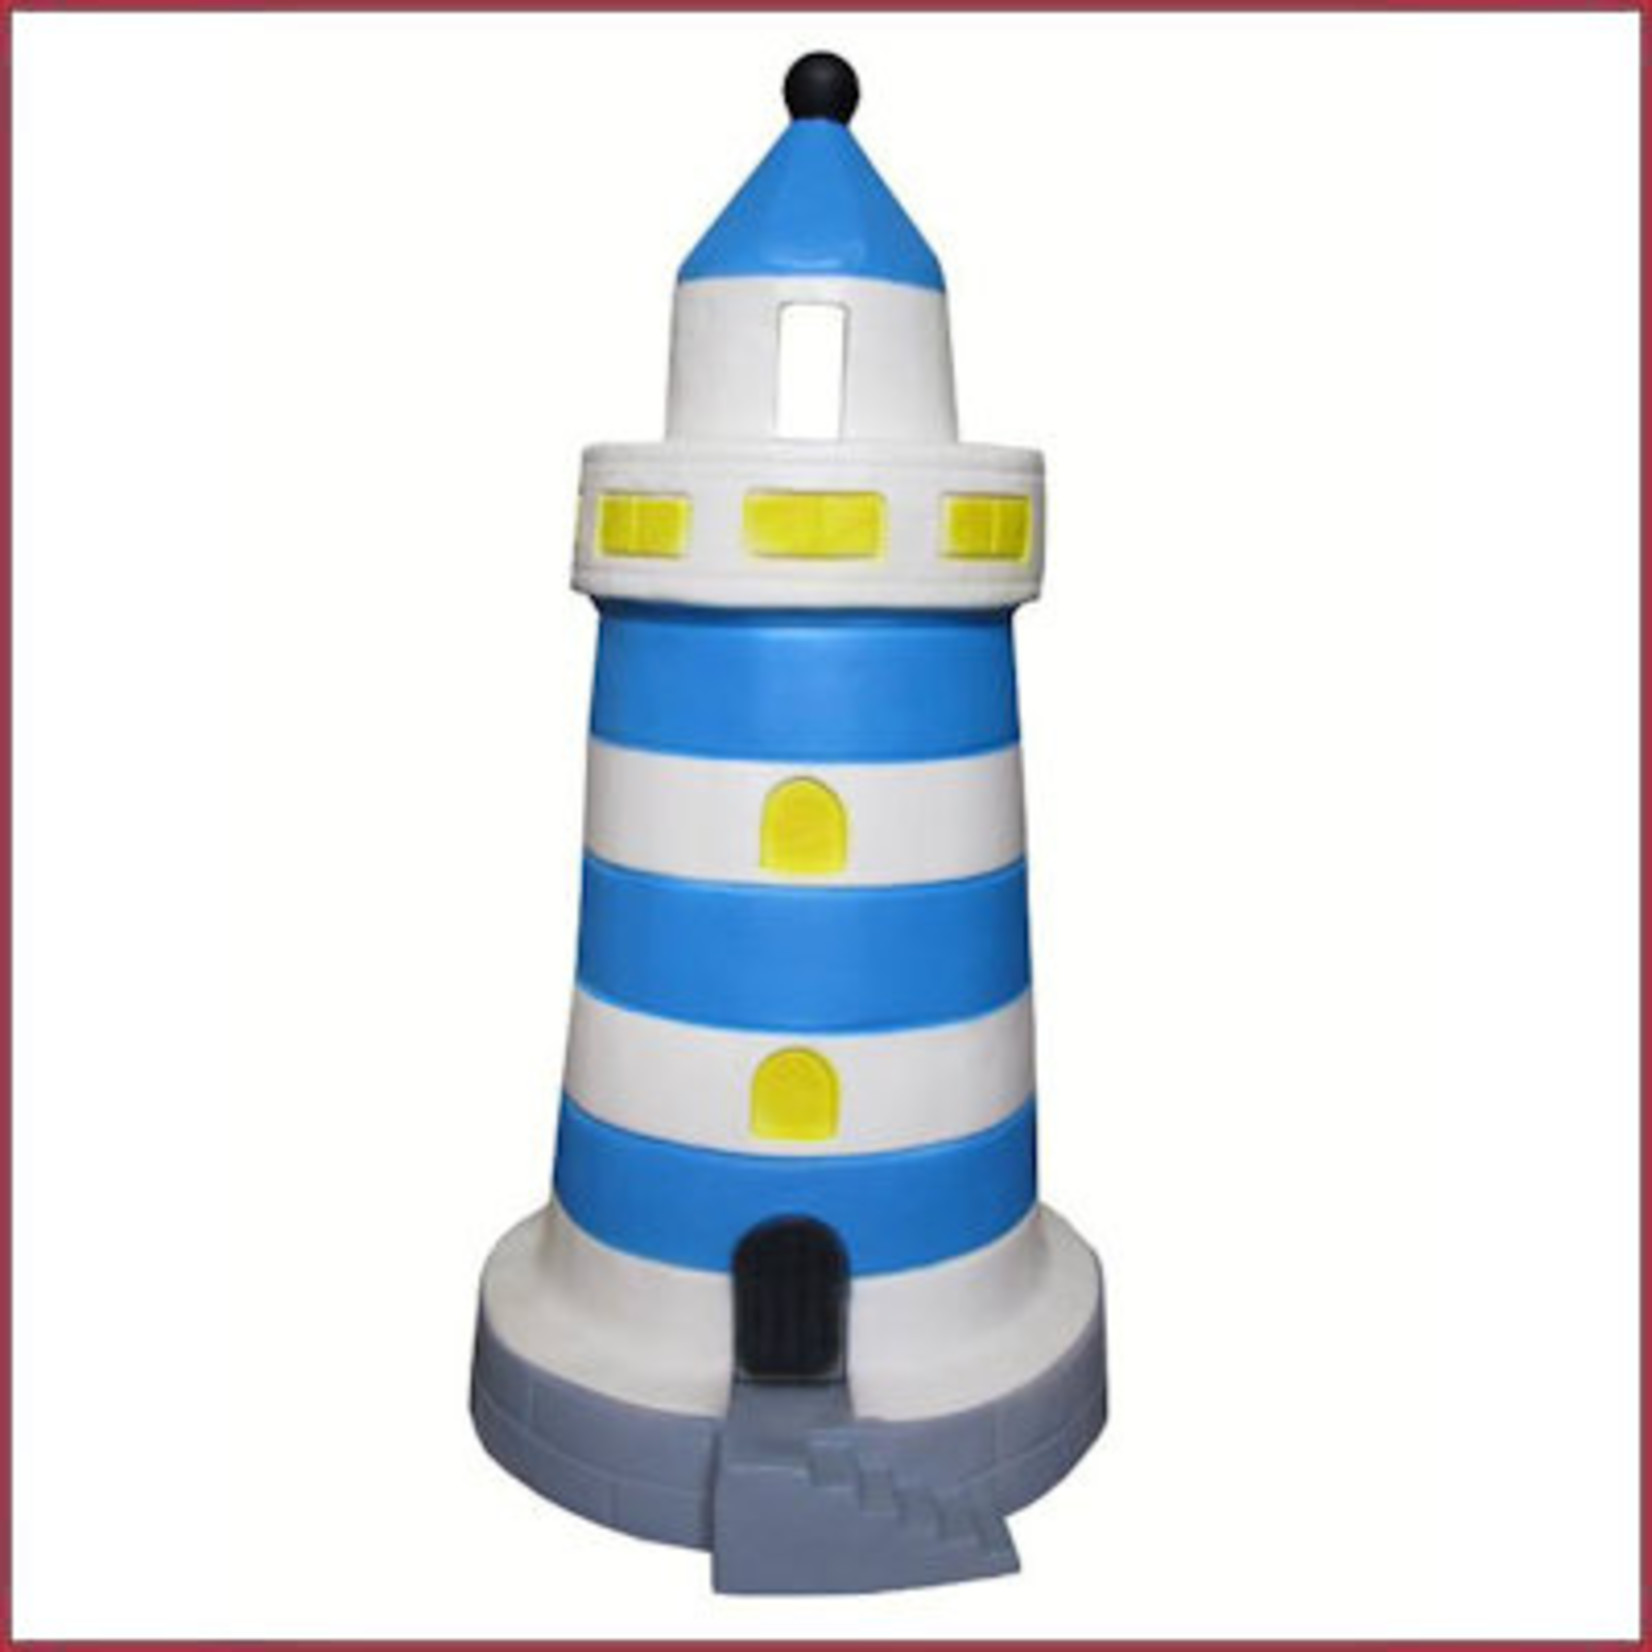 Vuurtorenlamp Blauw LED 35cm